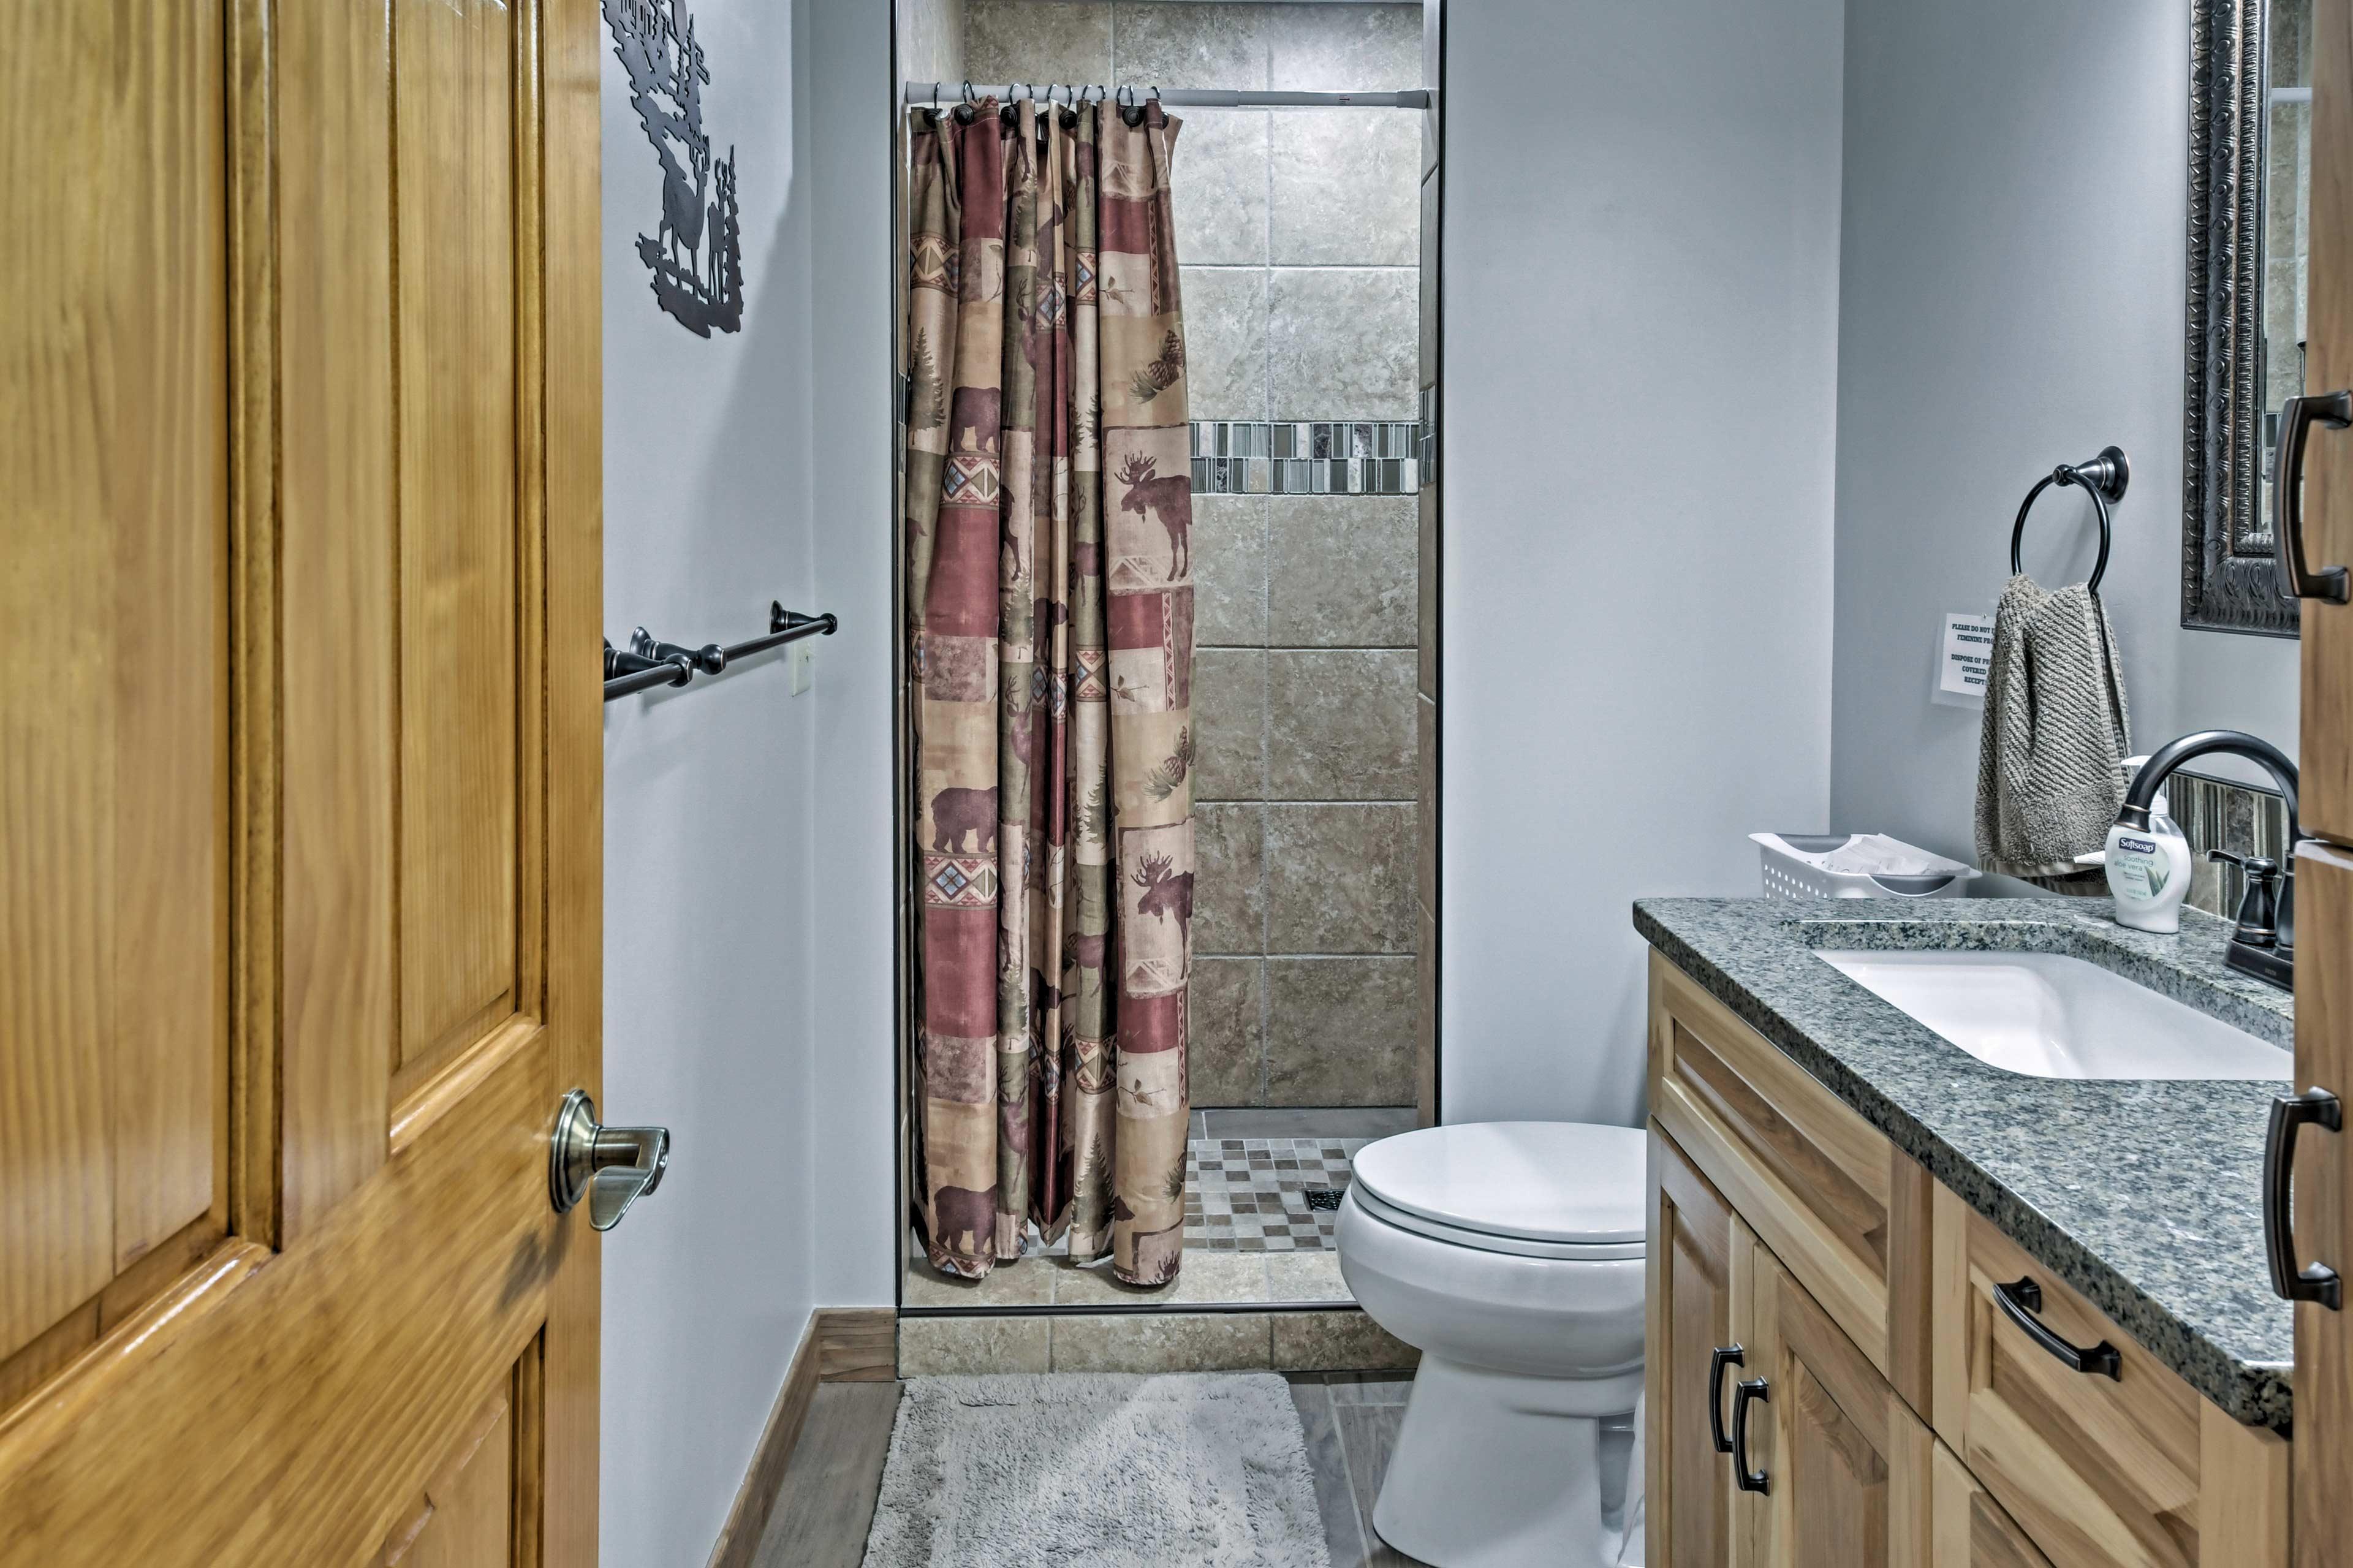 A walk-in shower highlights the bathroom.